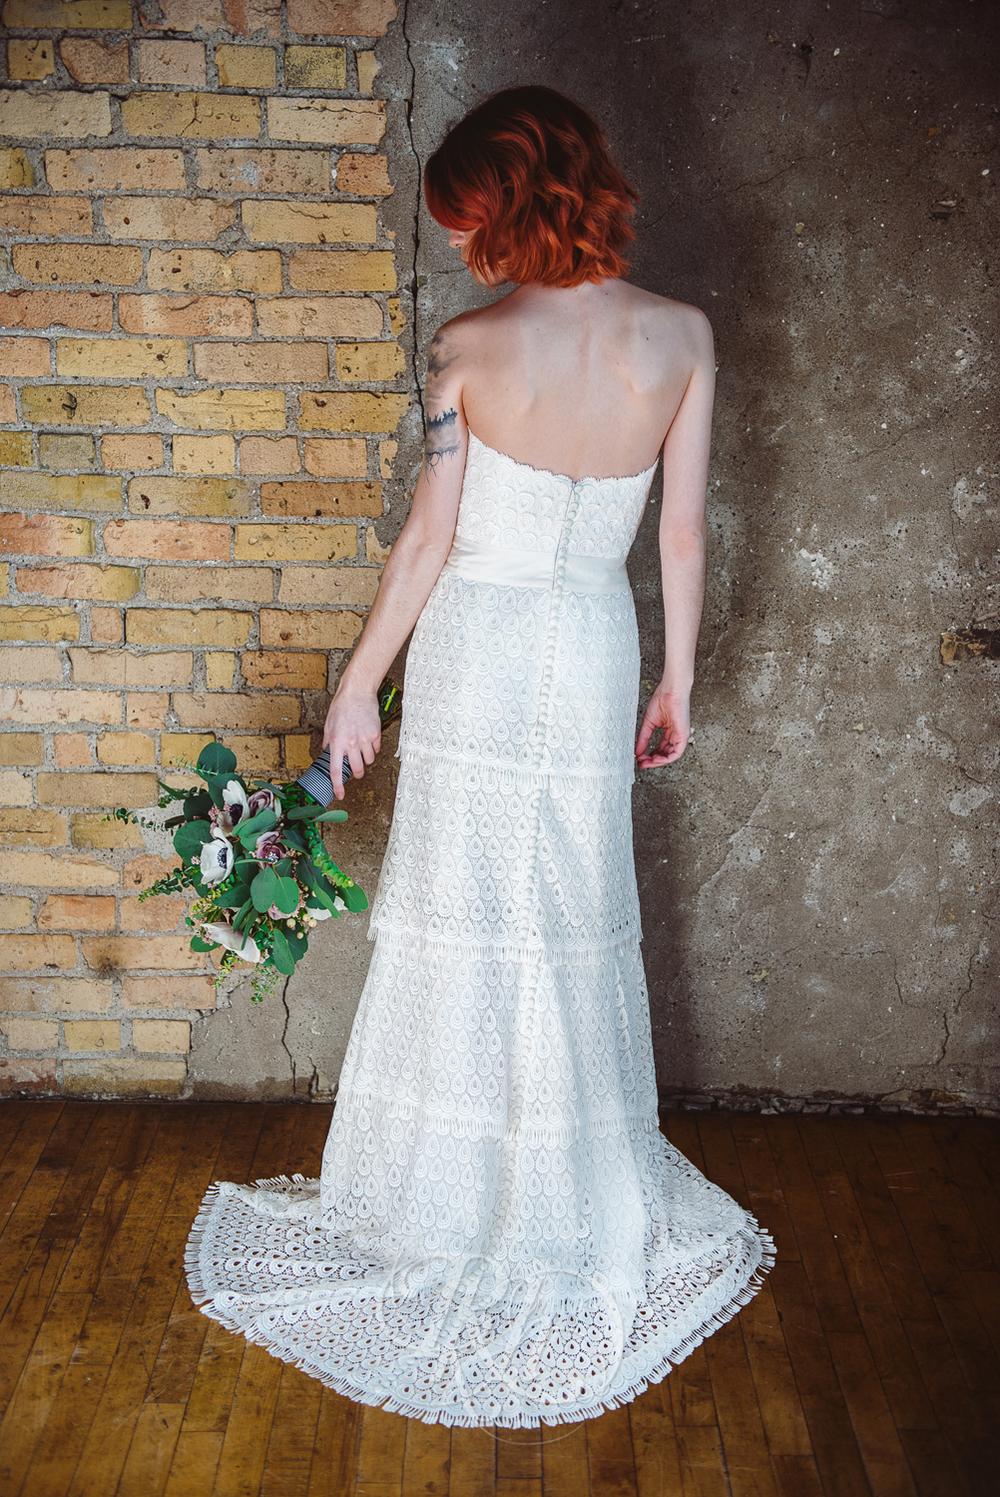 Minneapolis Wedding Shoot - RKH Images - Minnesota Wedding Photographer - Samples-12